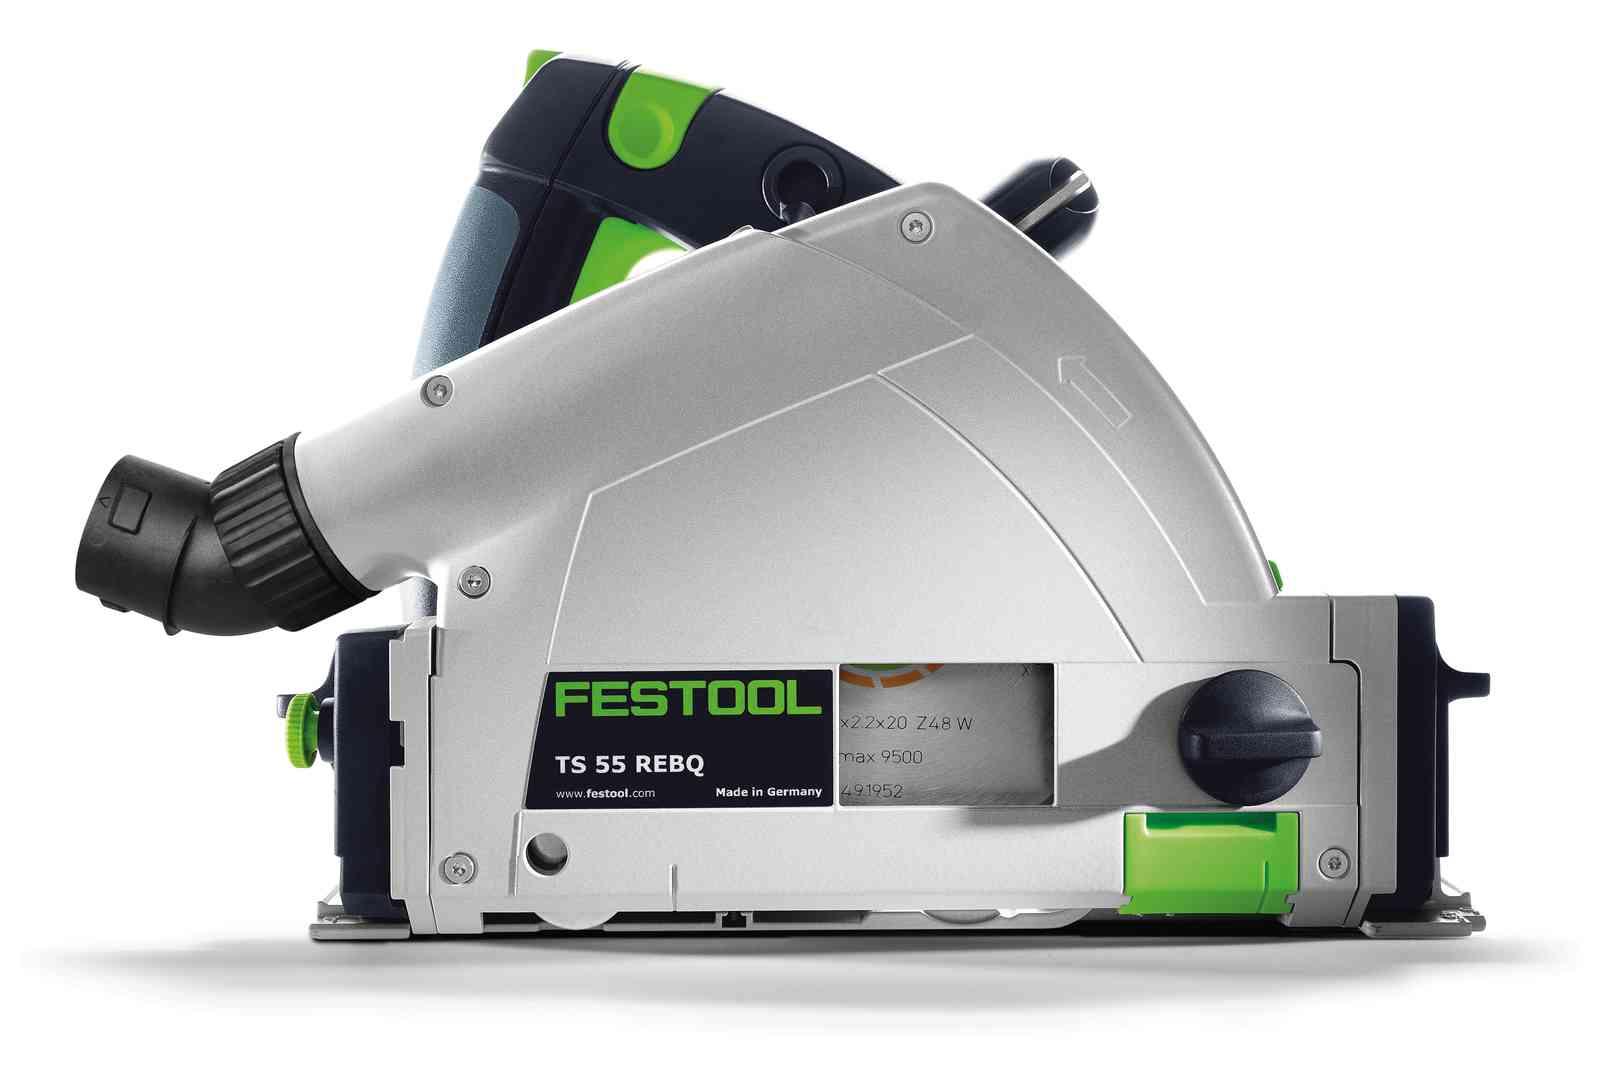 Festool Tauchsäge TS 55 REBQ-Plus